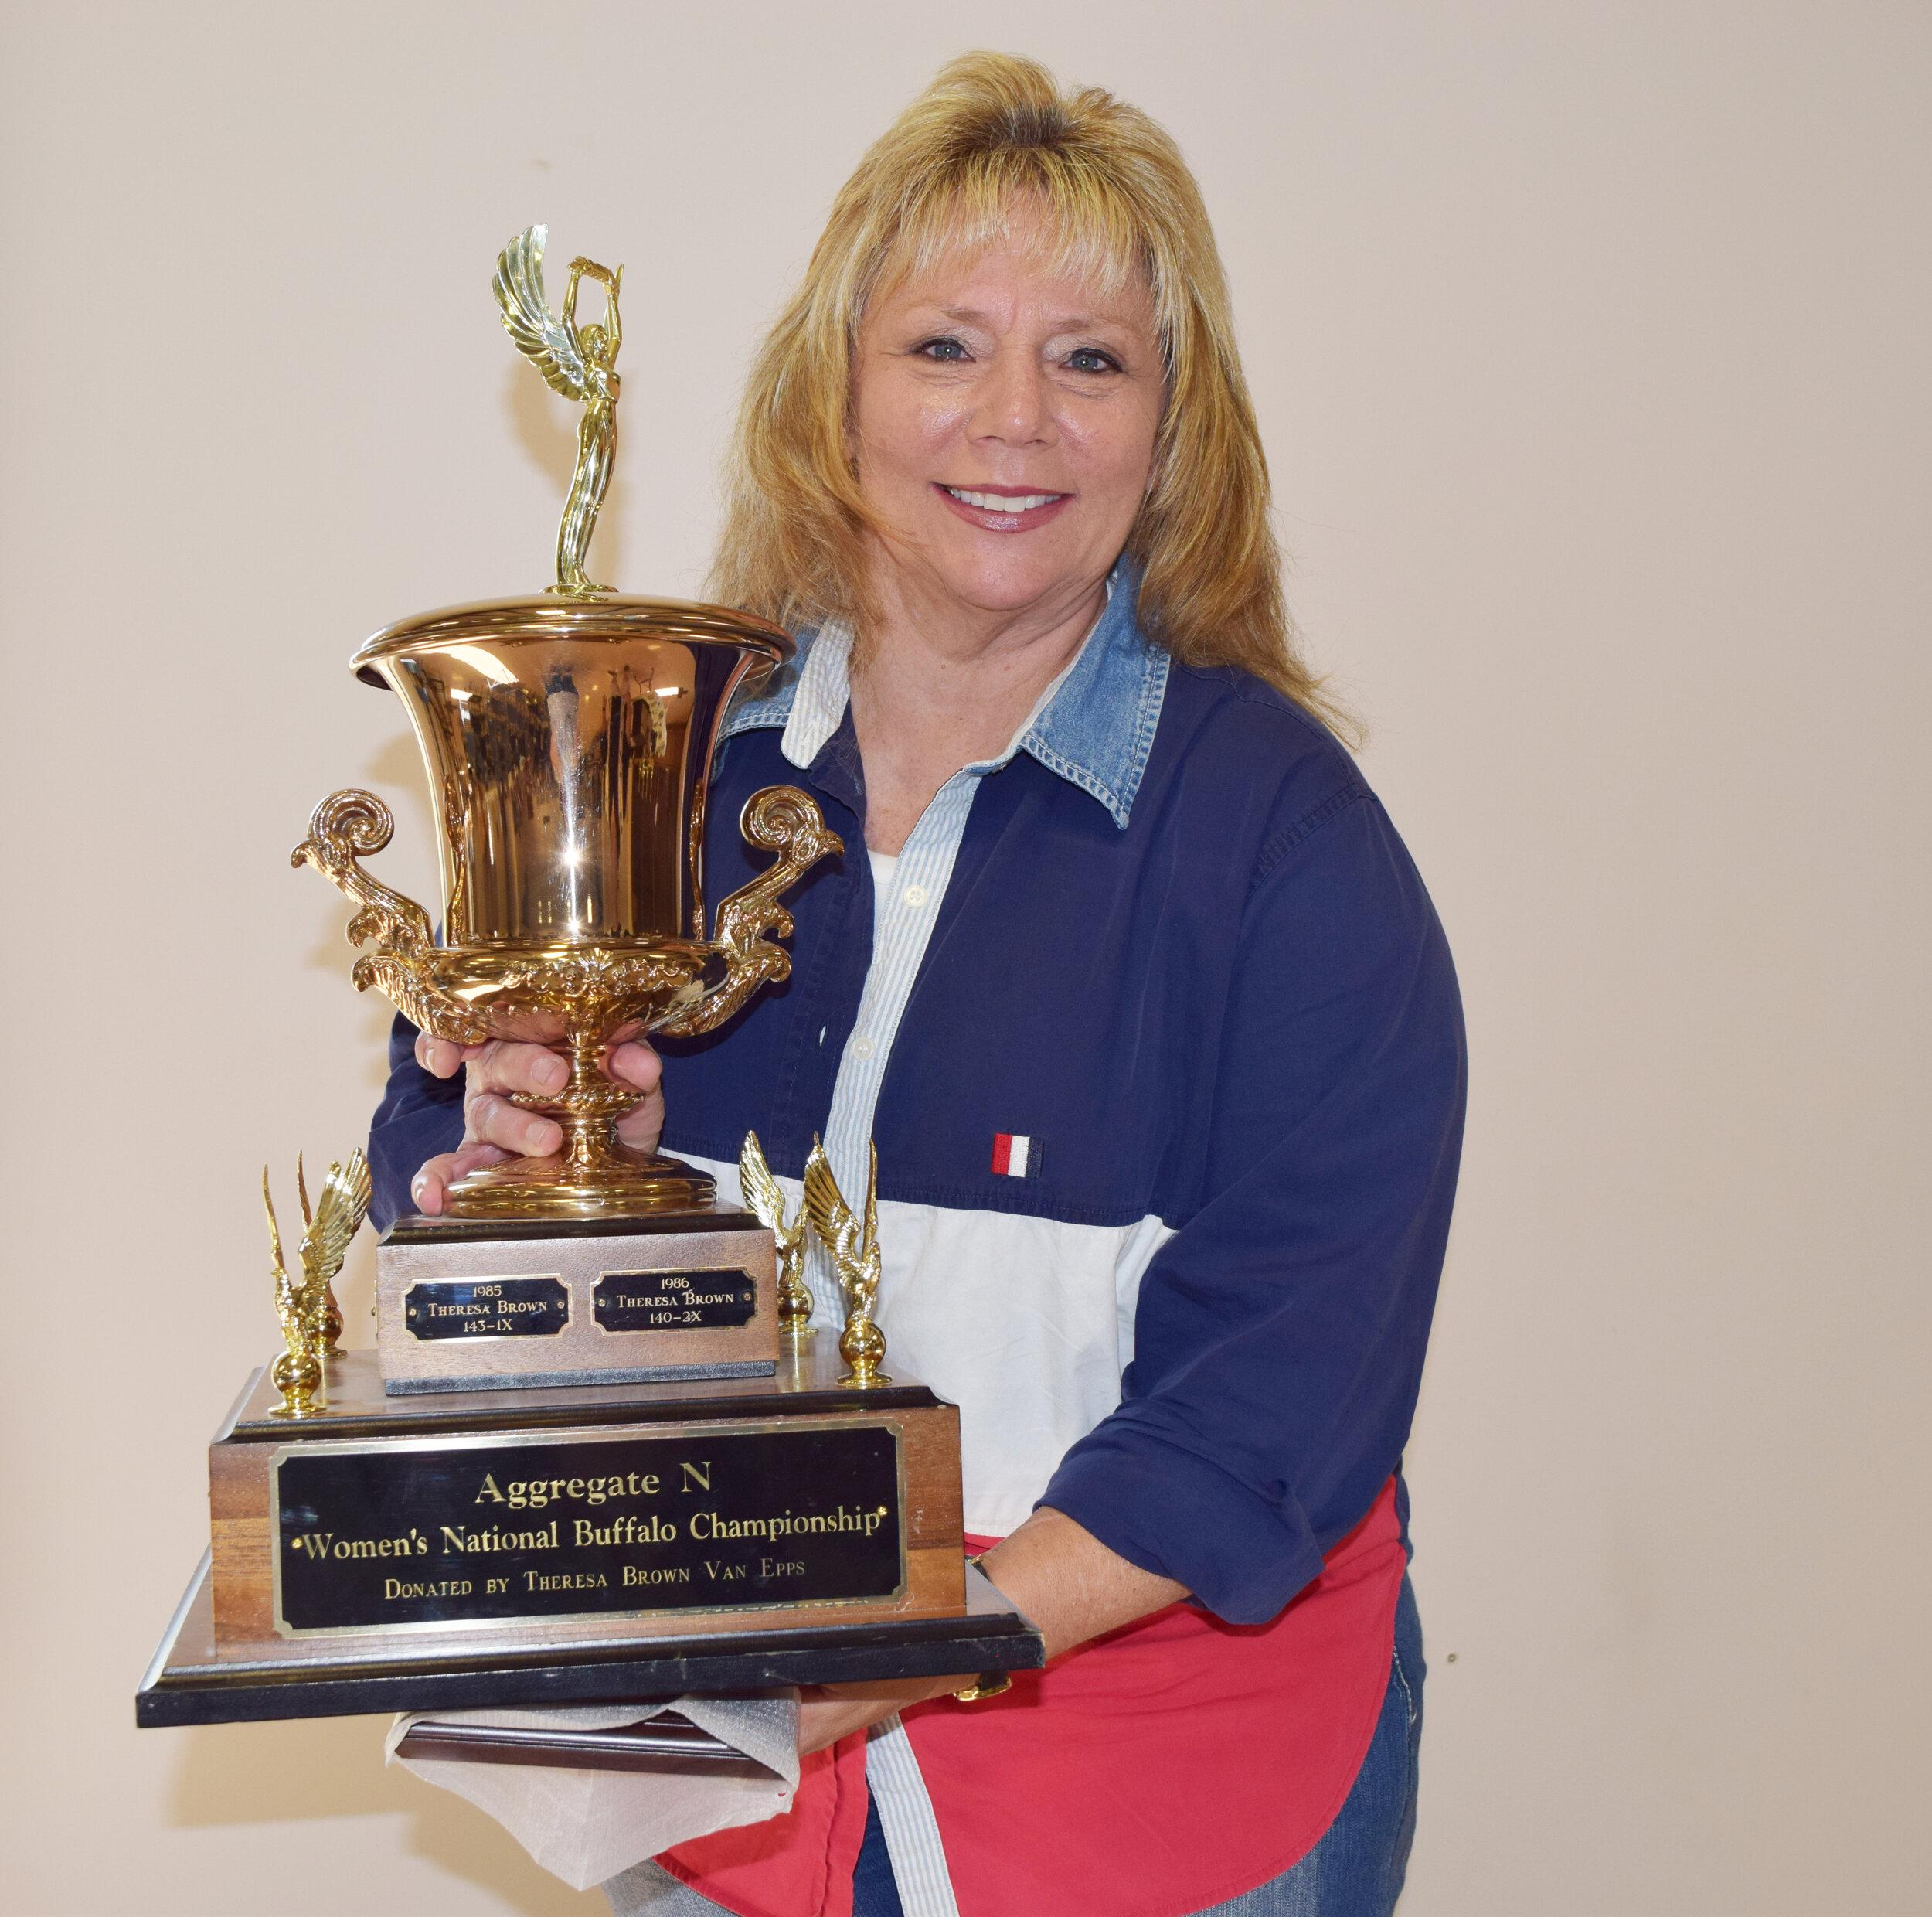 Theresa Van Epps - Aggregate N - Women's Buffalo Championship Winner